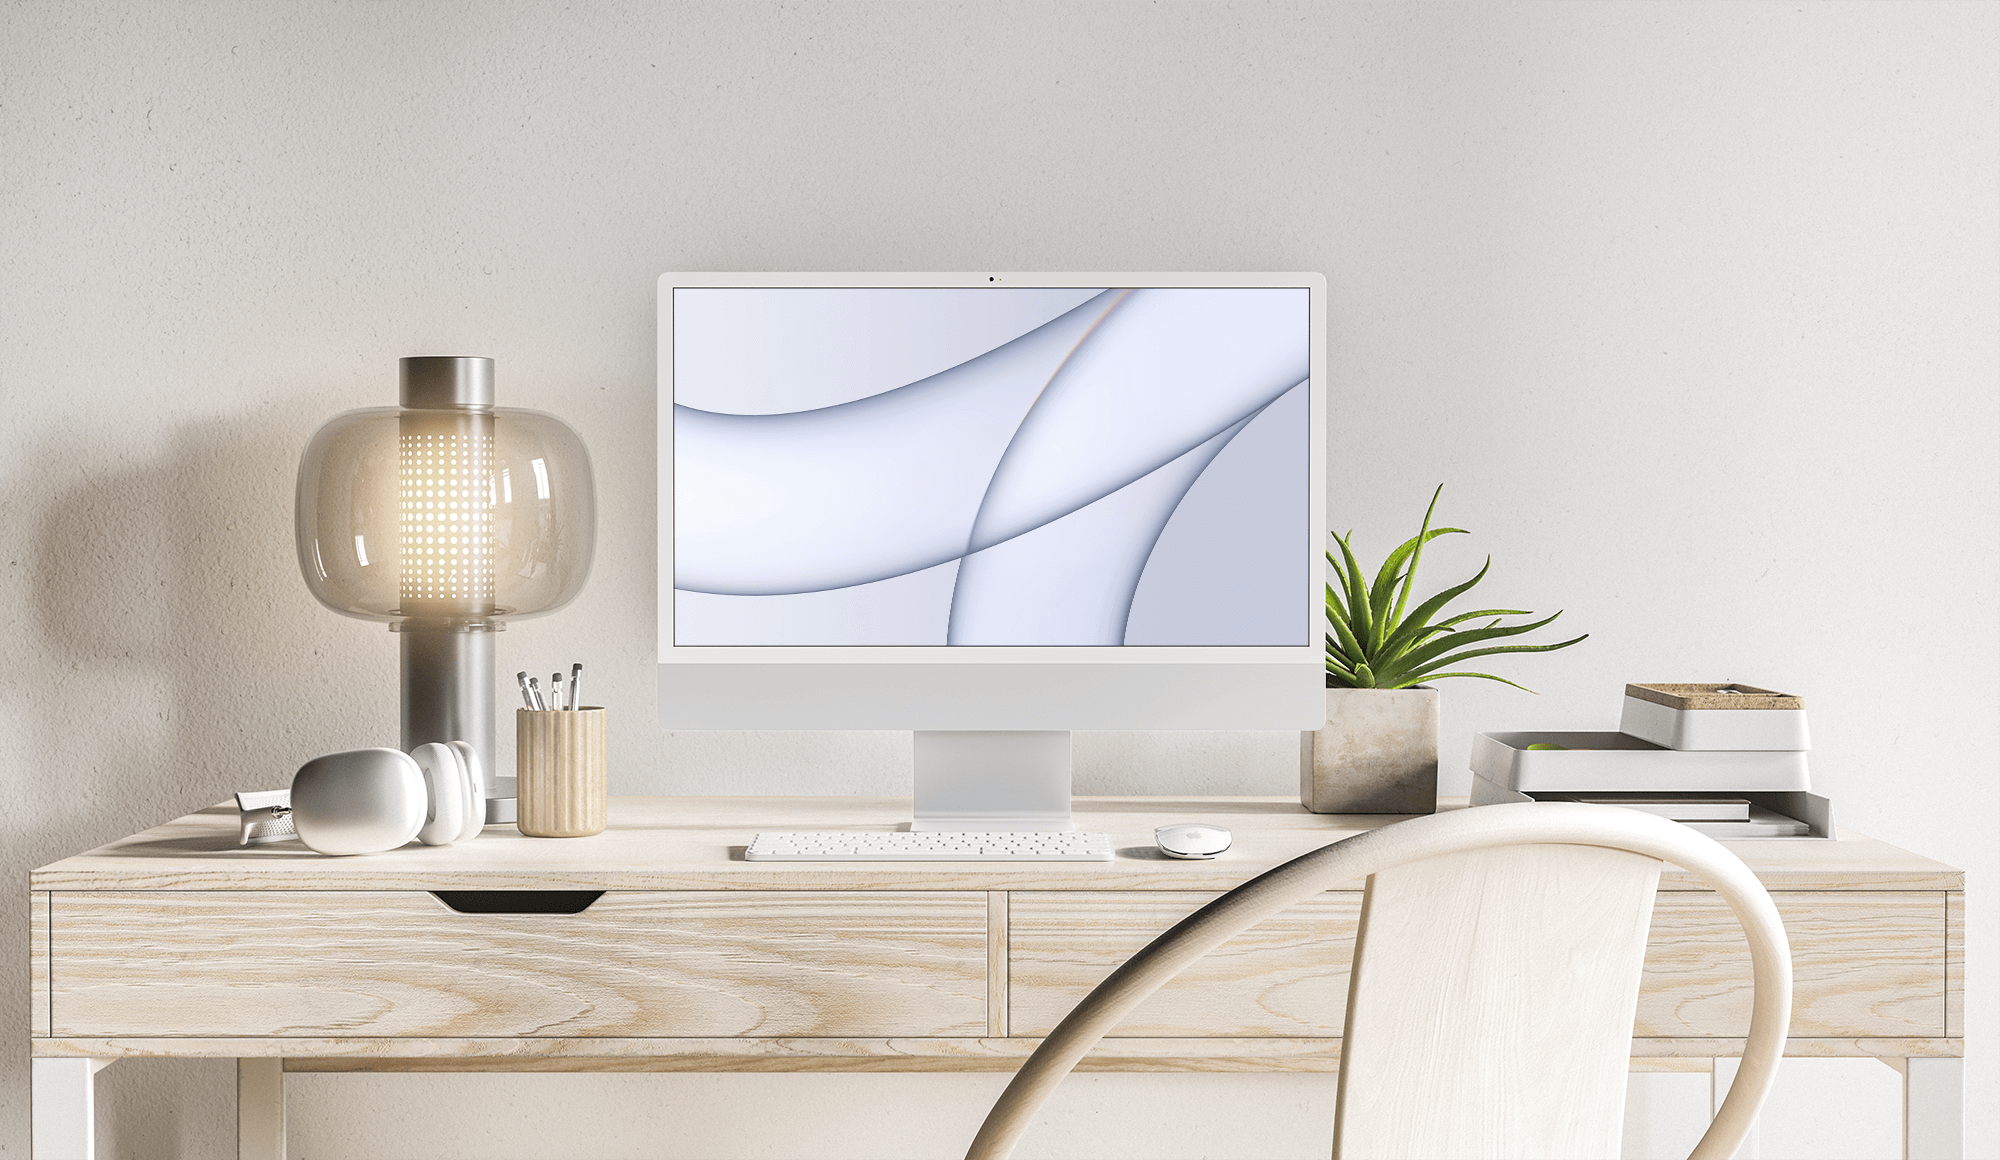 Free iMac 2021 on Desk Mockup